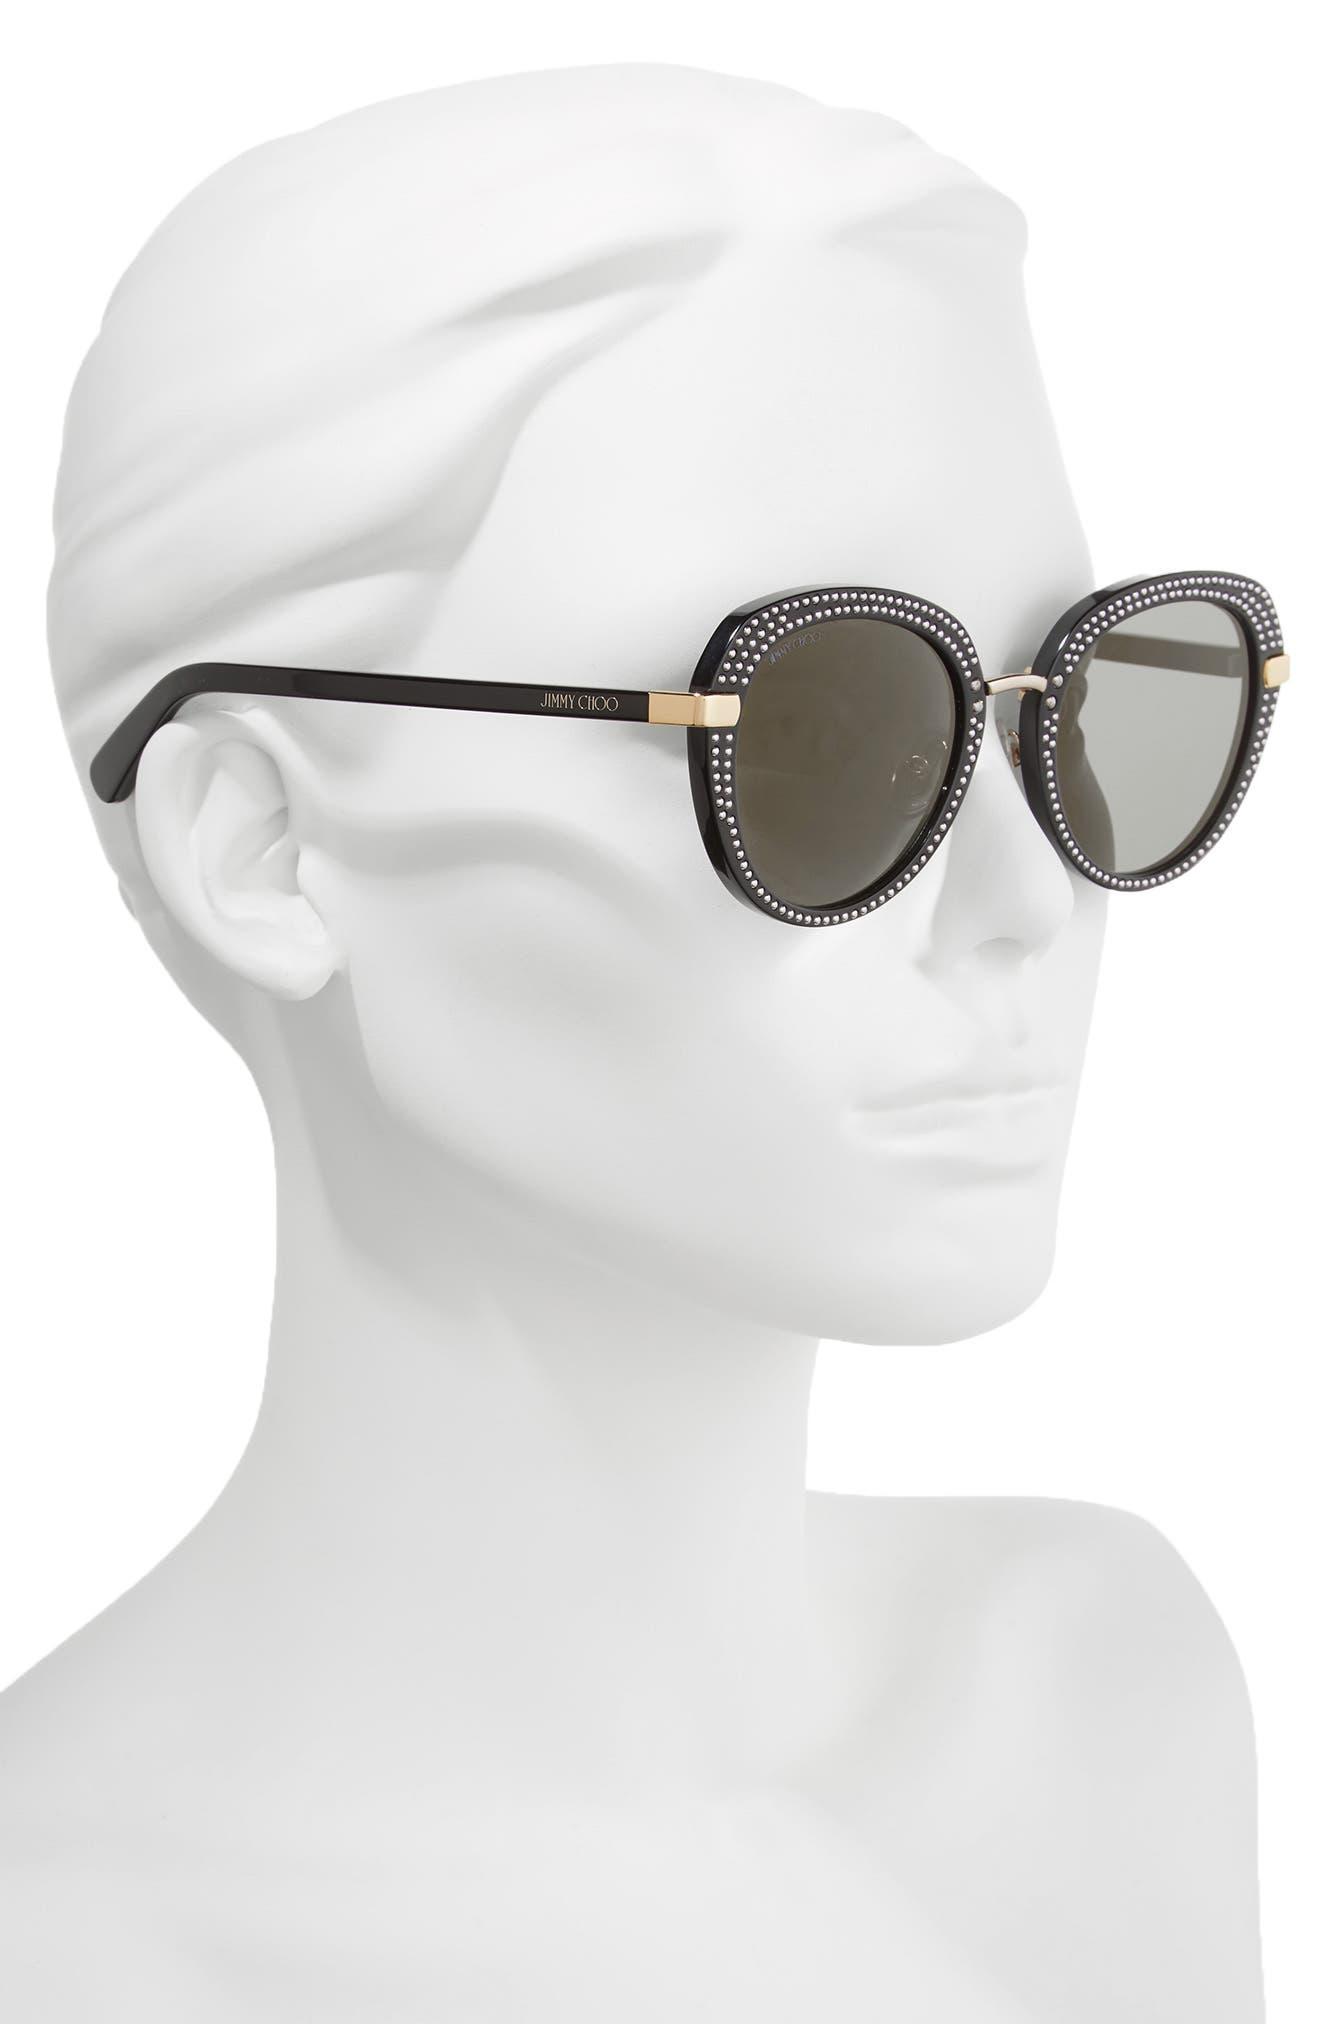 Moris 52mm Oversize Sunglasses,                             Alternate thumbnail 2, color,                             BLACK GOLD